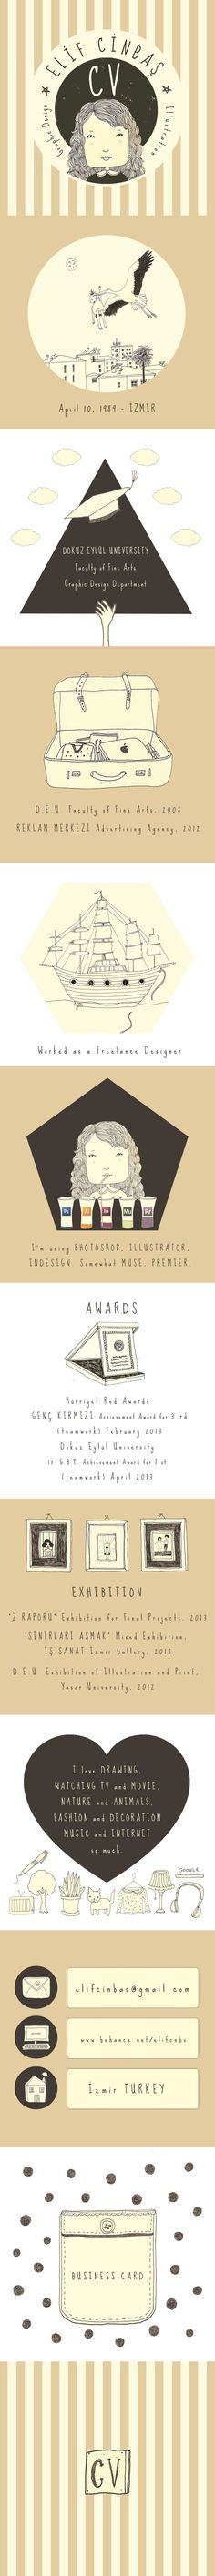 Illustrations of my CV design by elif cinbaş, via Behance